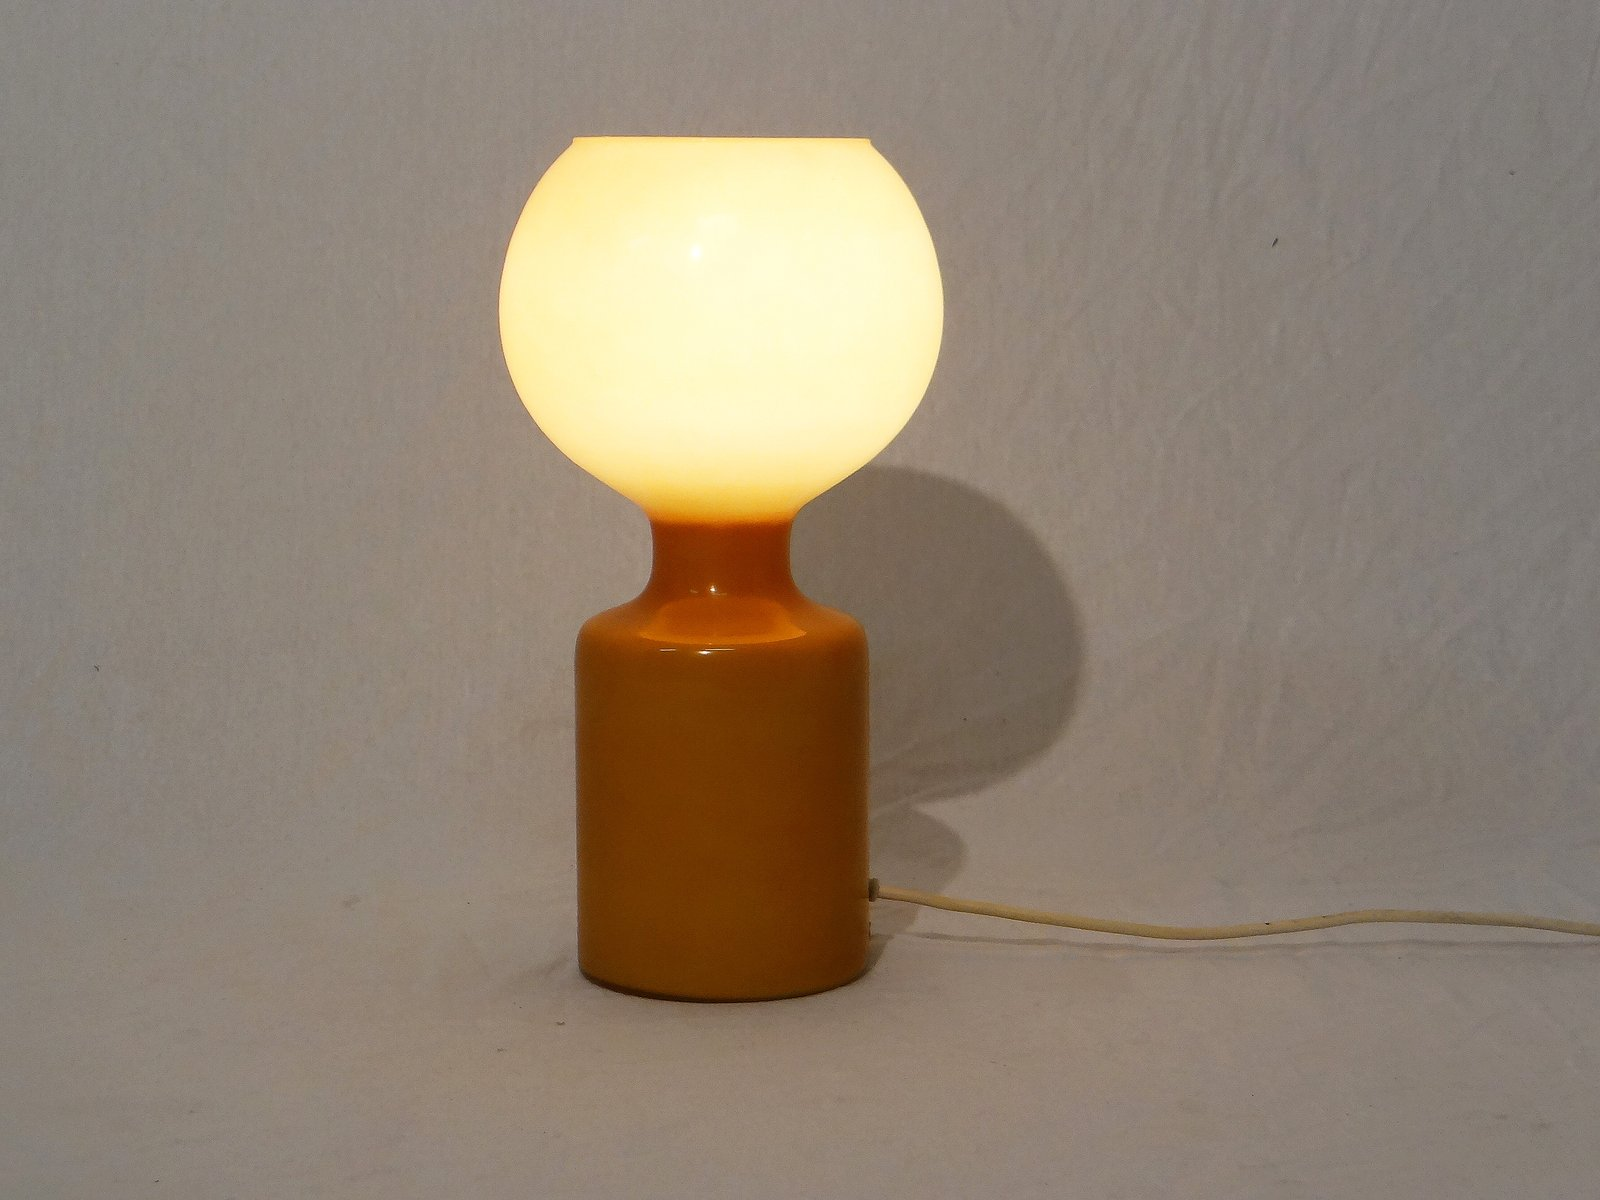 vintage orangefarbene murano lampe bei pamono kaufen. Black Bedroom Furniture Sets. Home Design Ideas